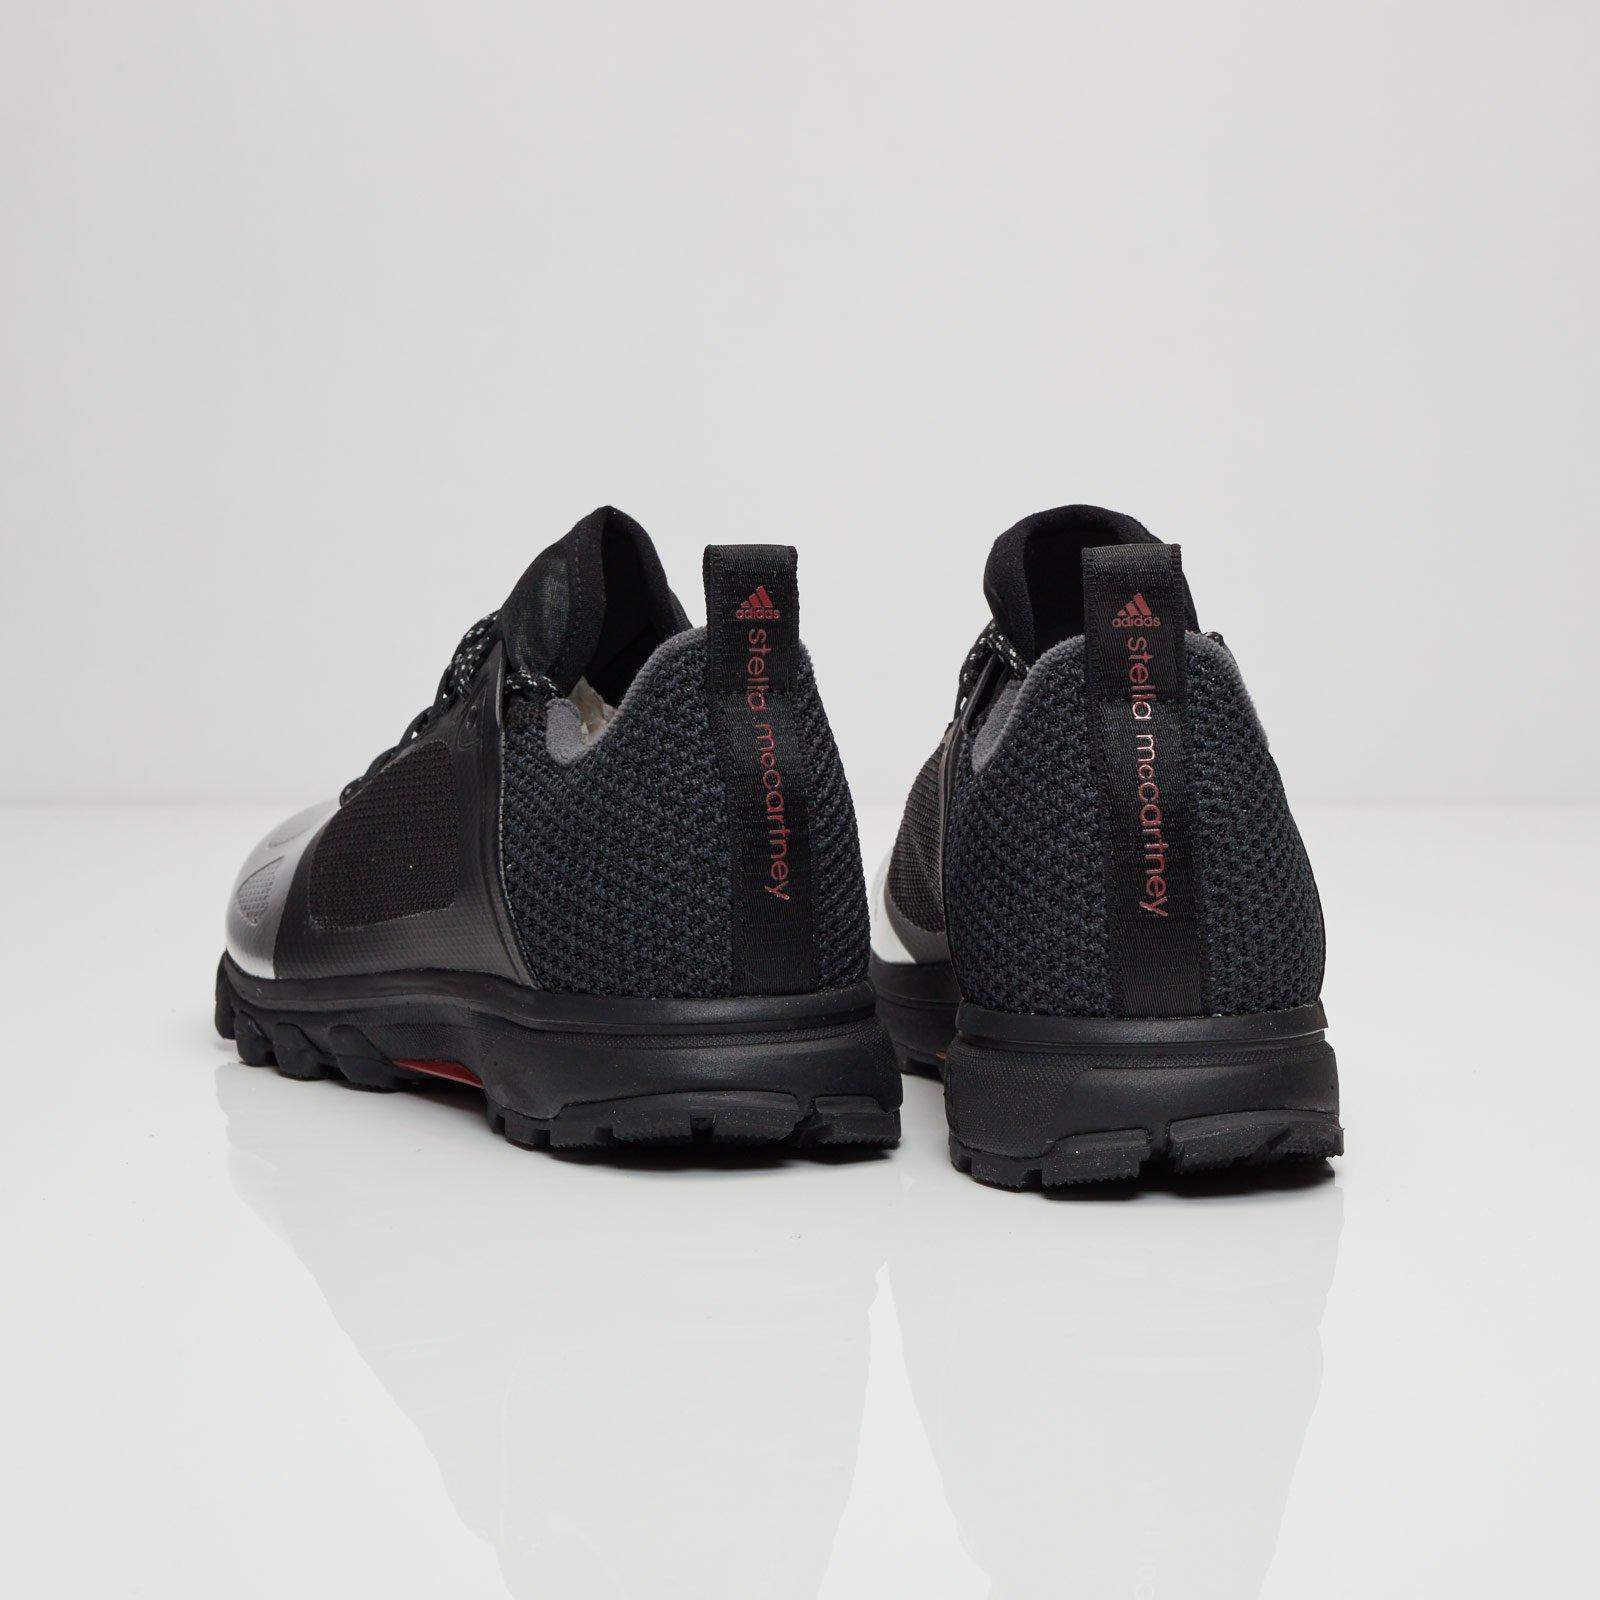 Adidas by Stella McCartney Adizero XT (Women's)